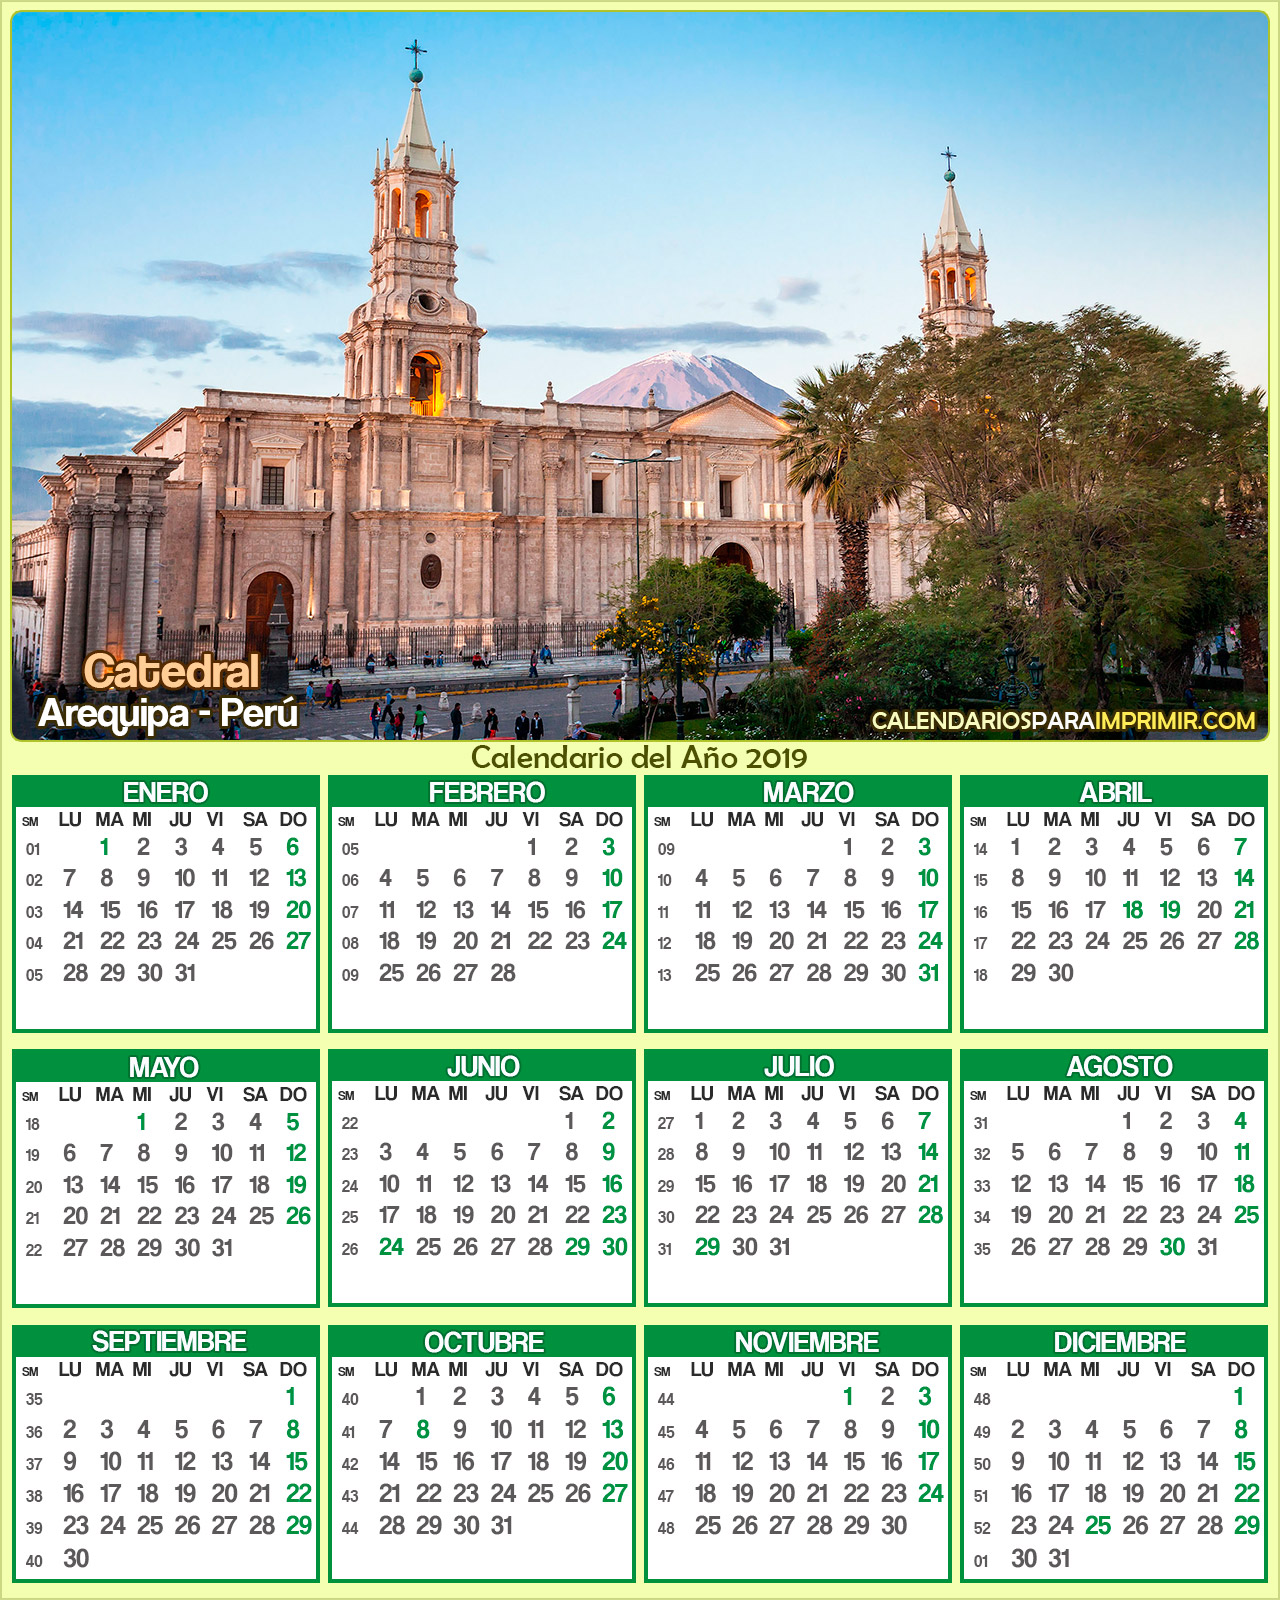 calendario peru 2019 arequipa